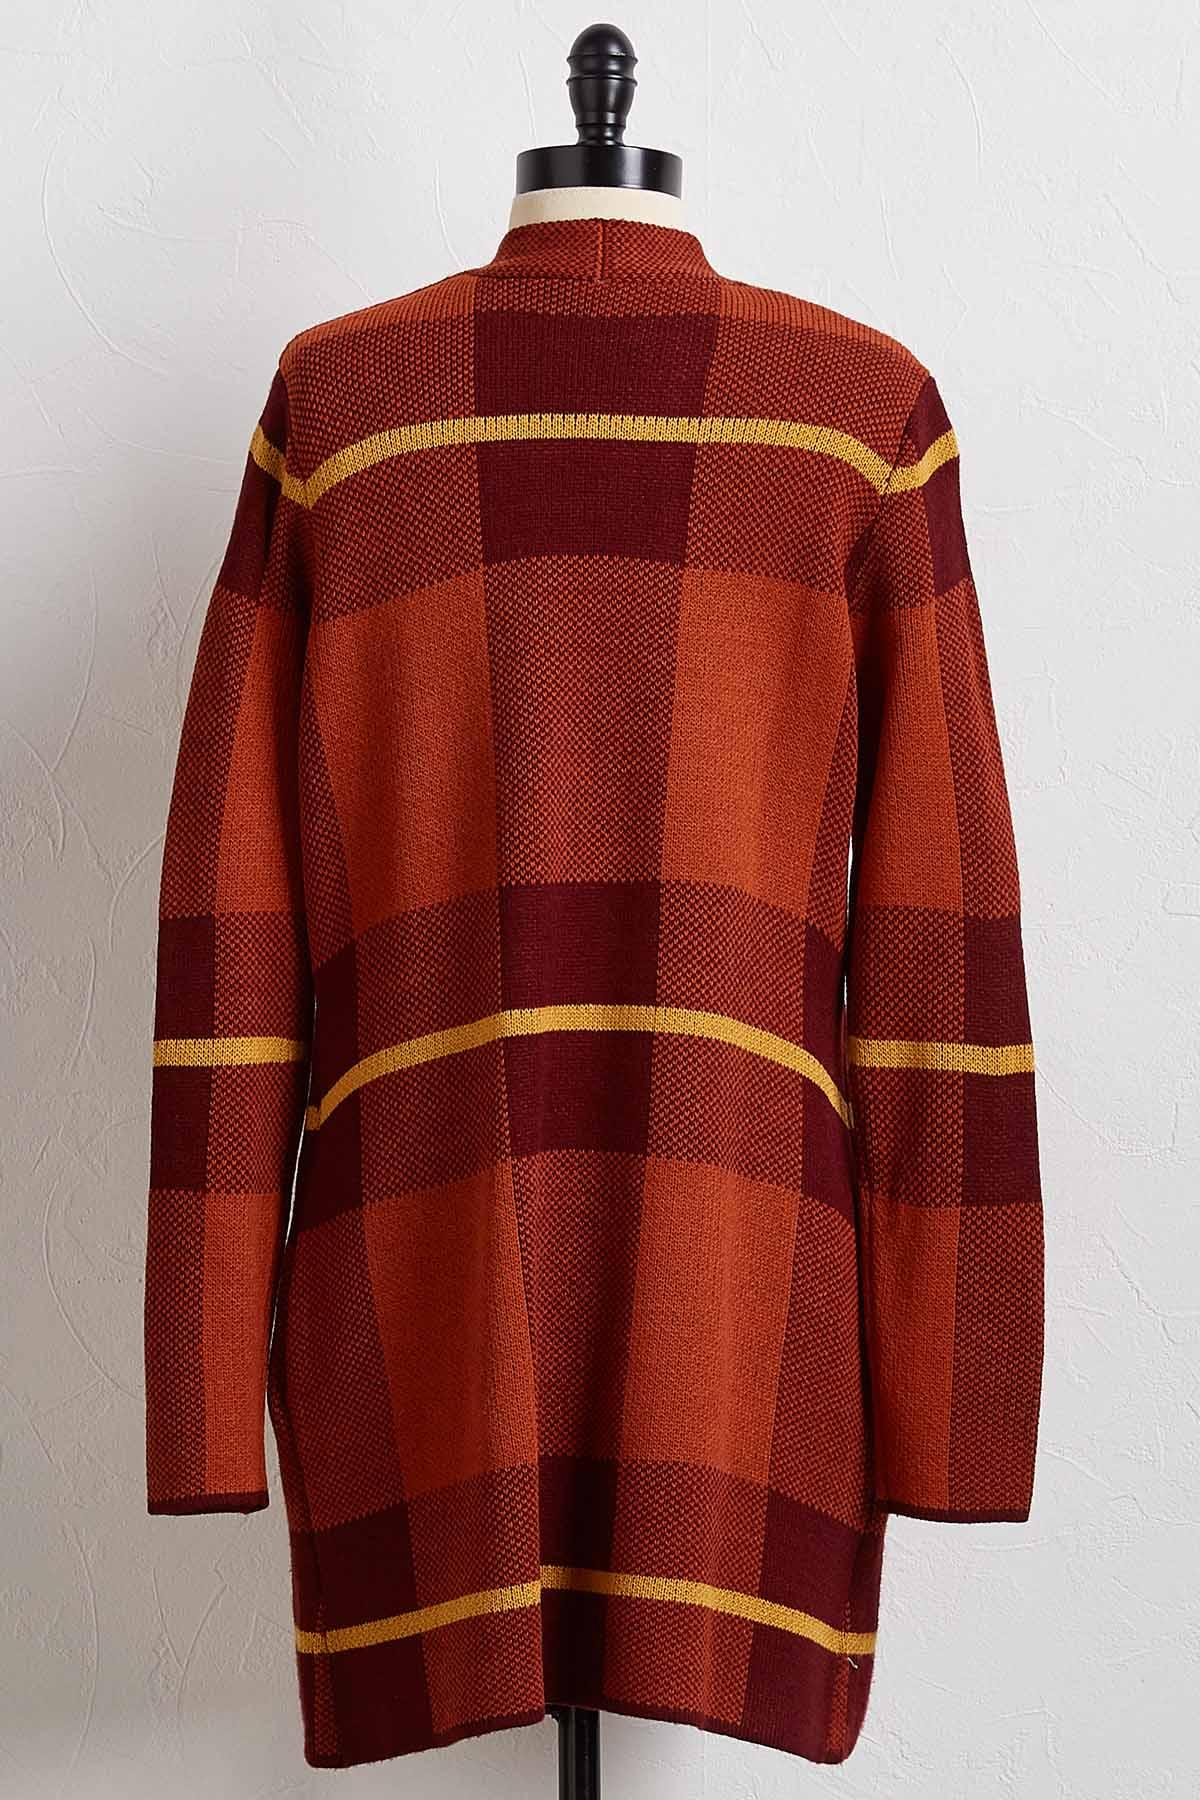 Autumn Spice Plaid Cardigan